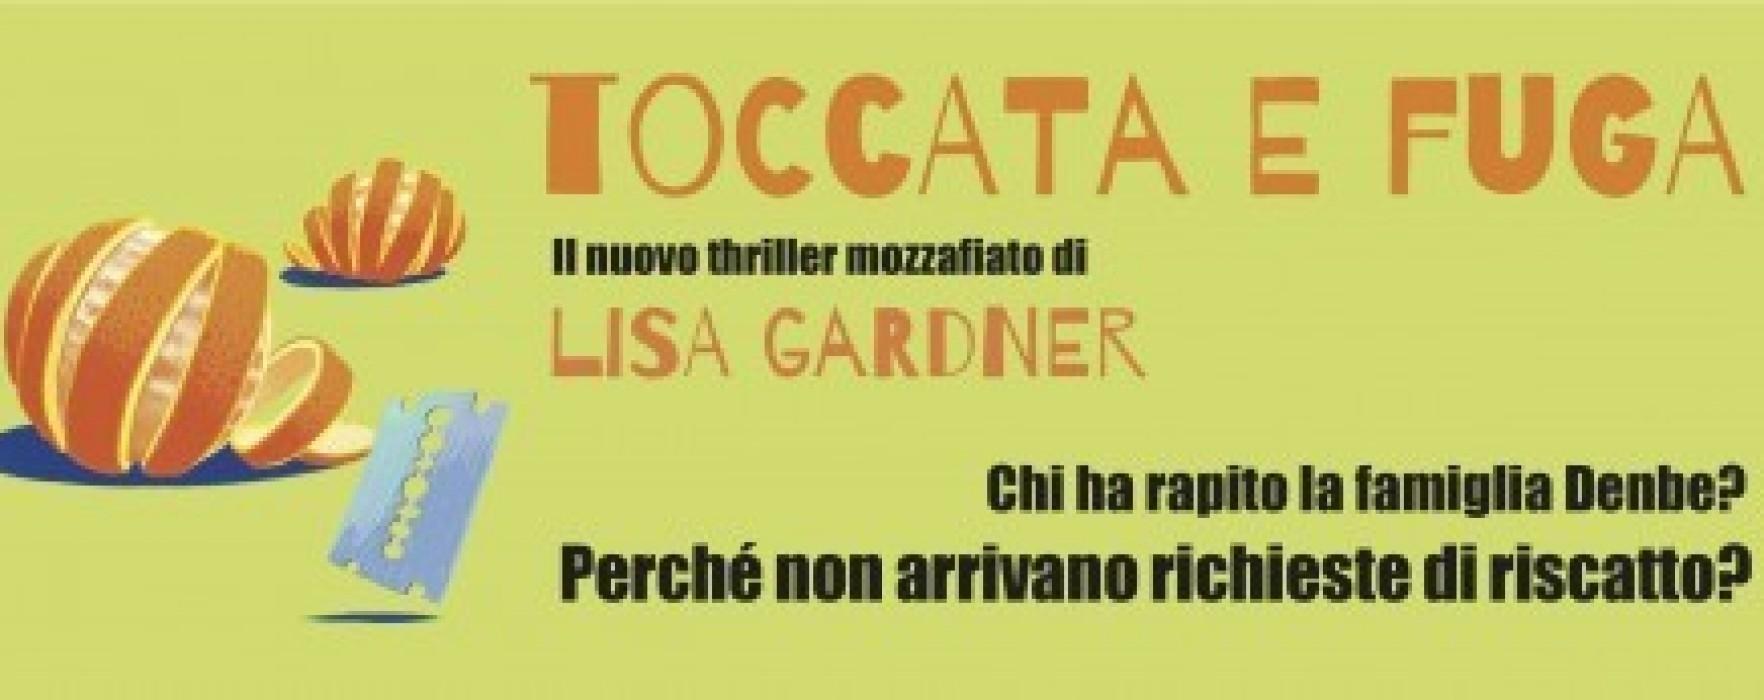 Toccata e fuga di Lisa Gardner